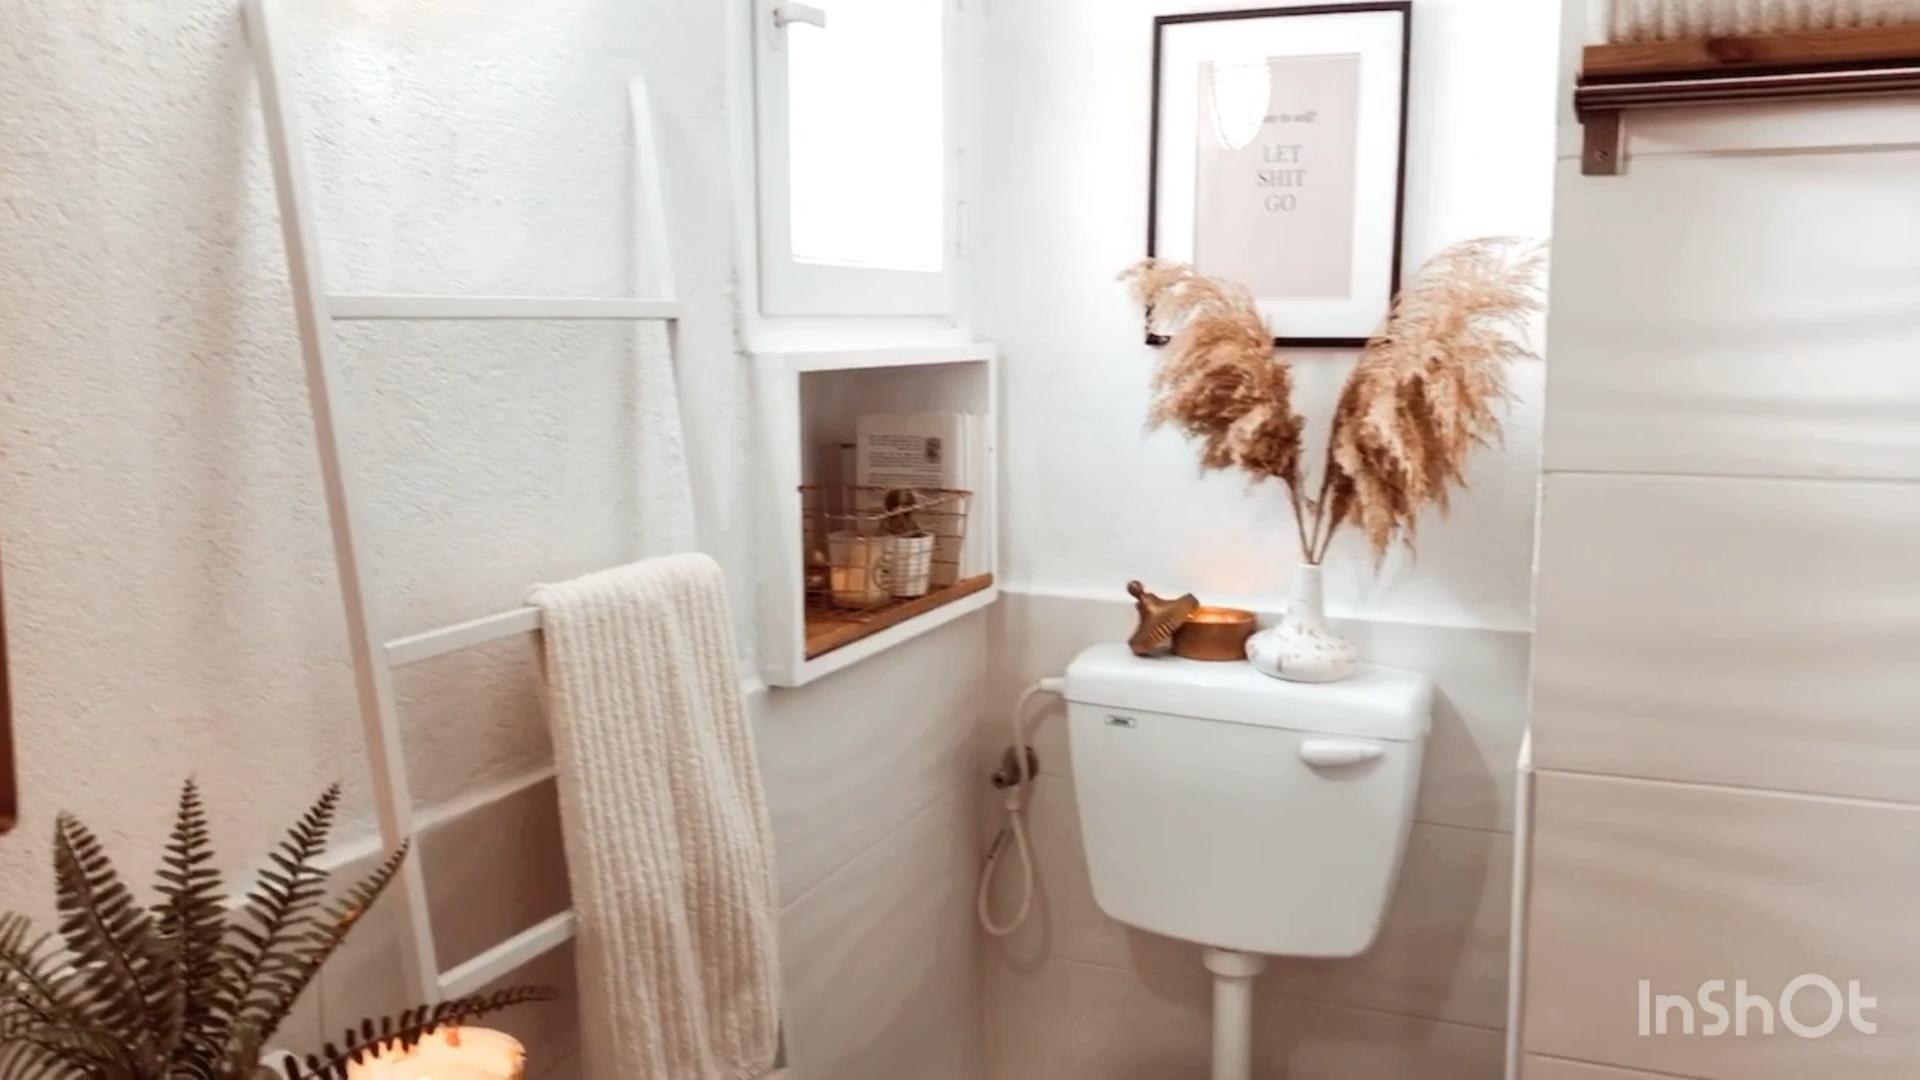 #diy #homedecor #bathroomdecor